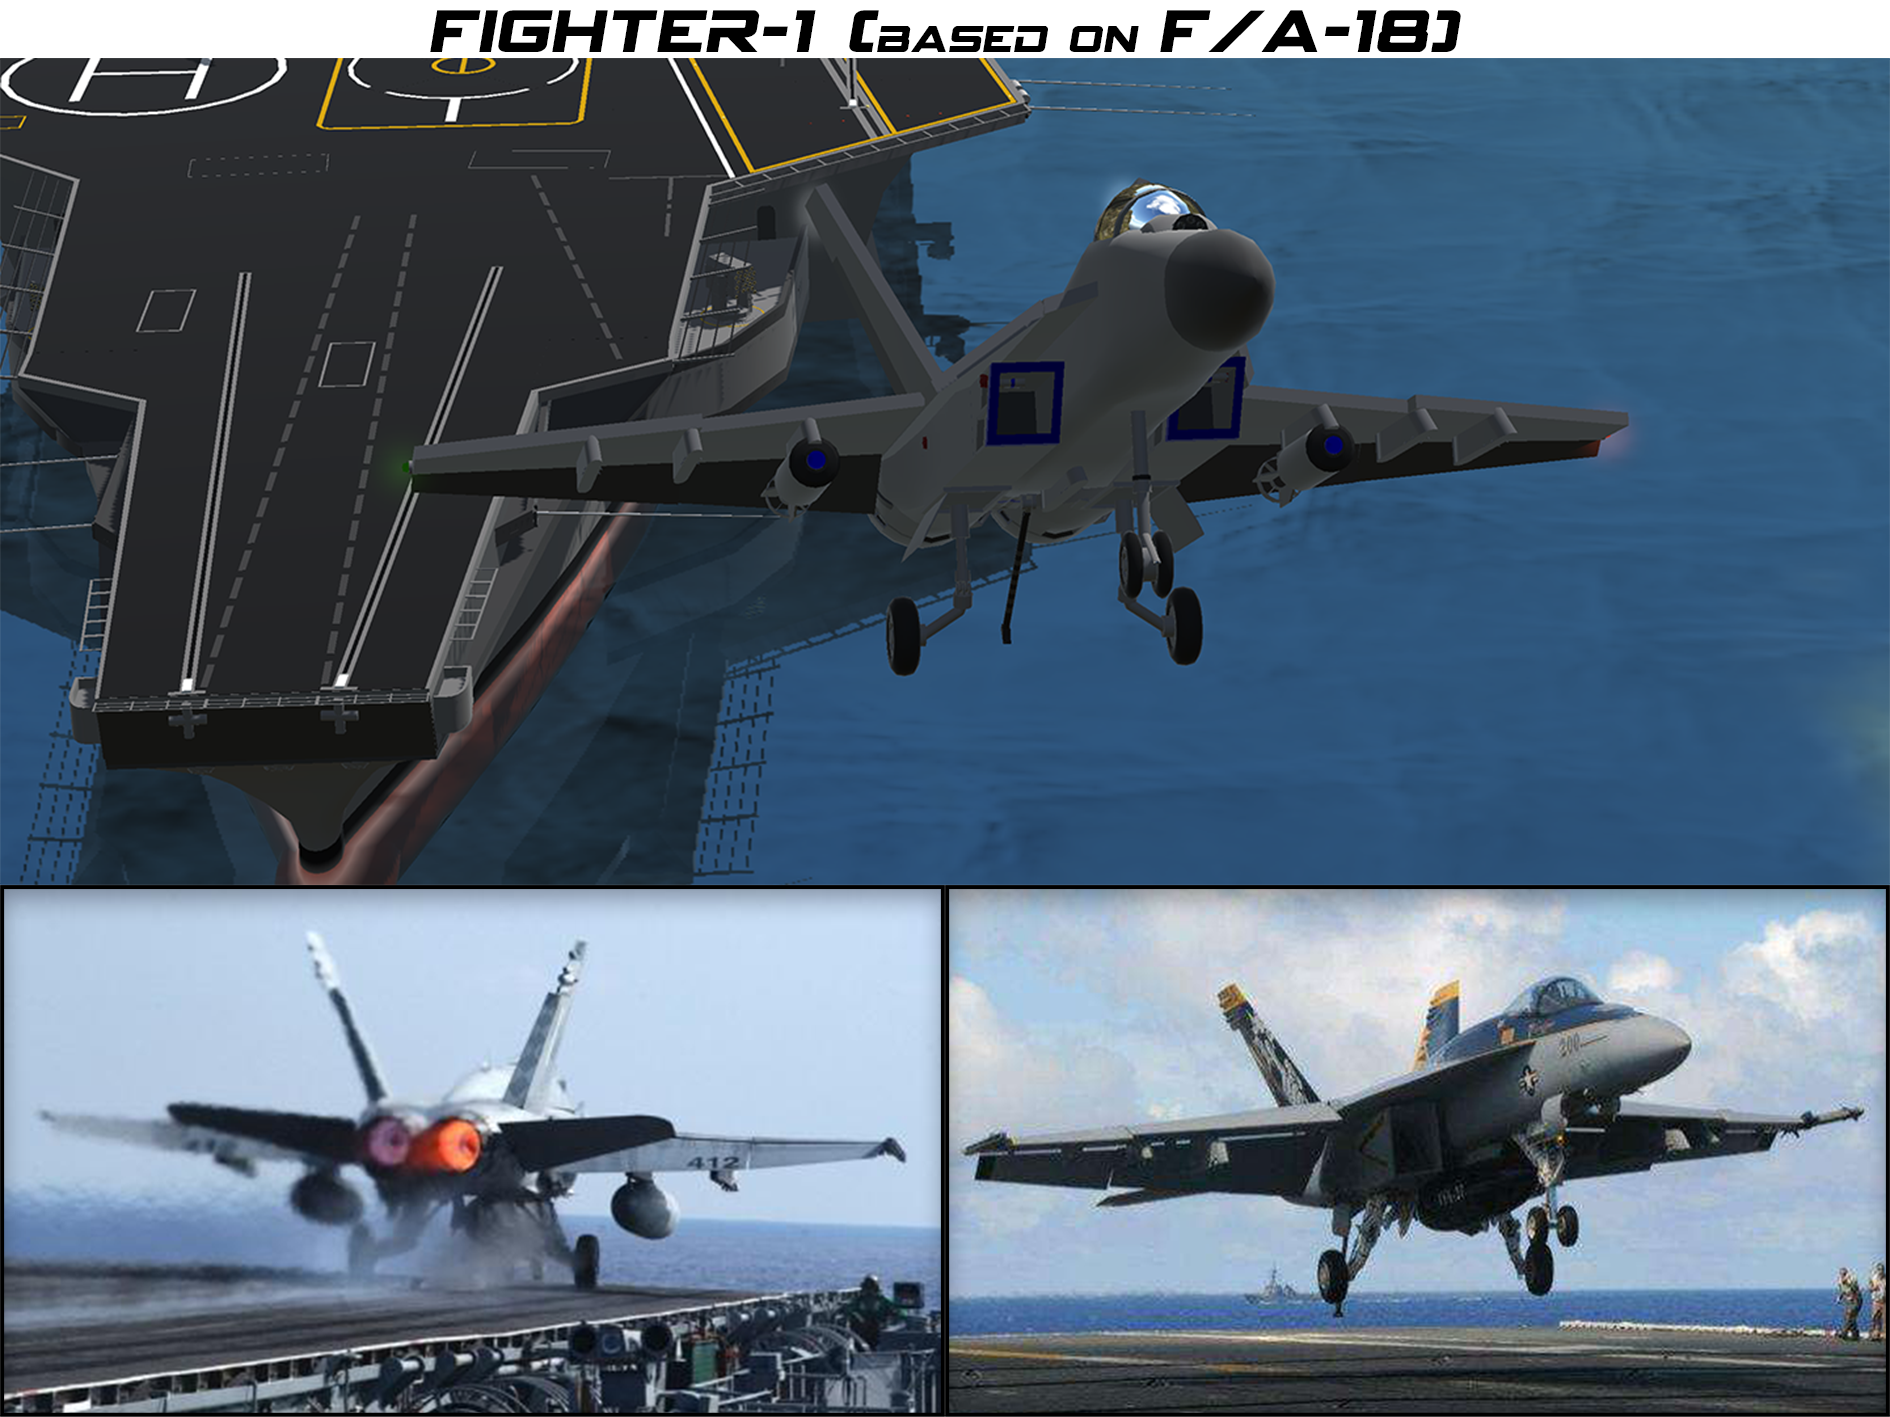 Fighter-1